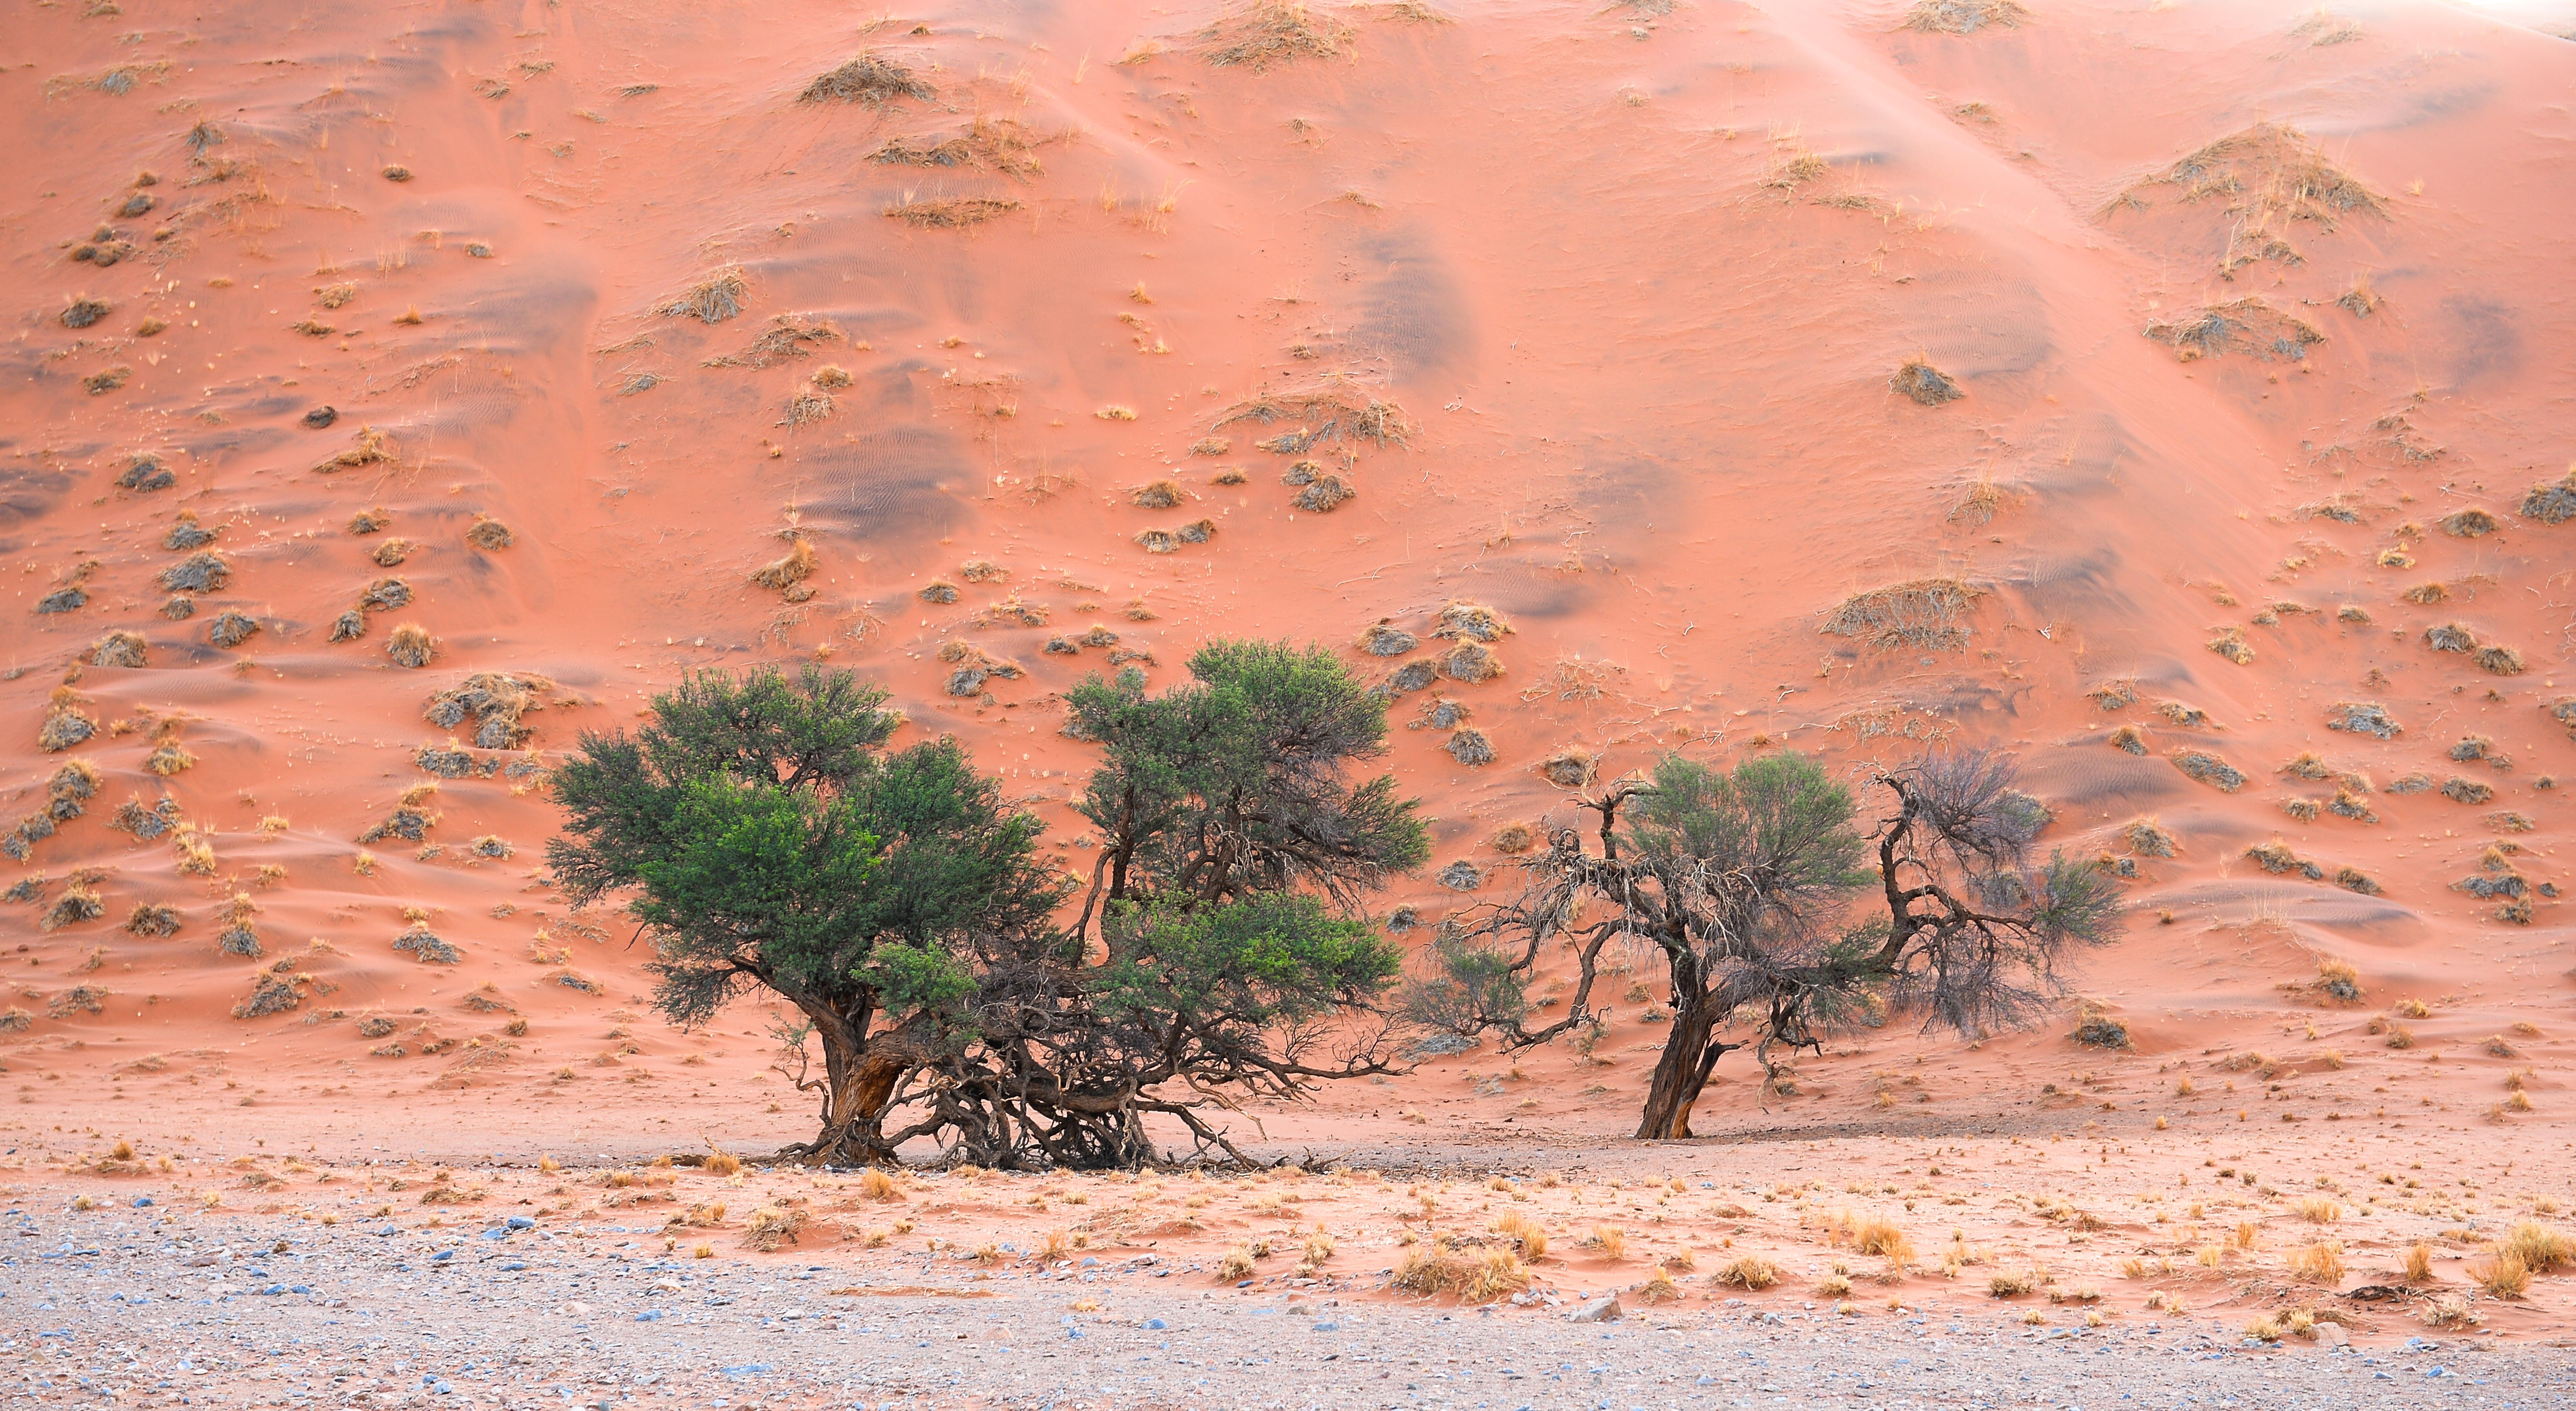 Solitäre in der Namib Kameldorn (Vachellia erioloba)  ©Joh.Ratermann